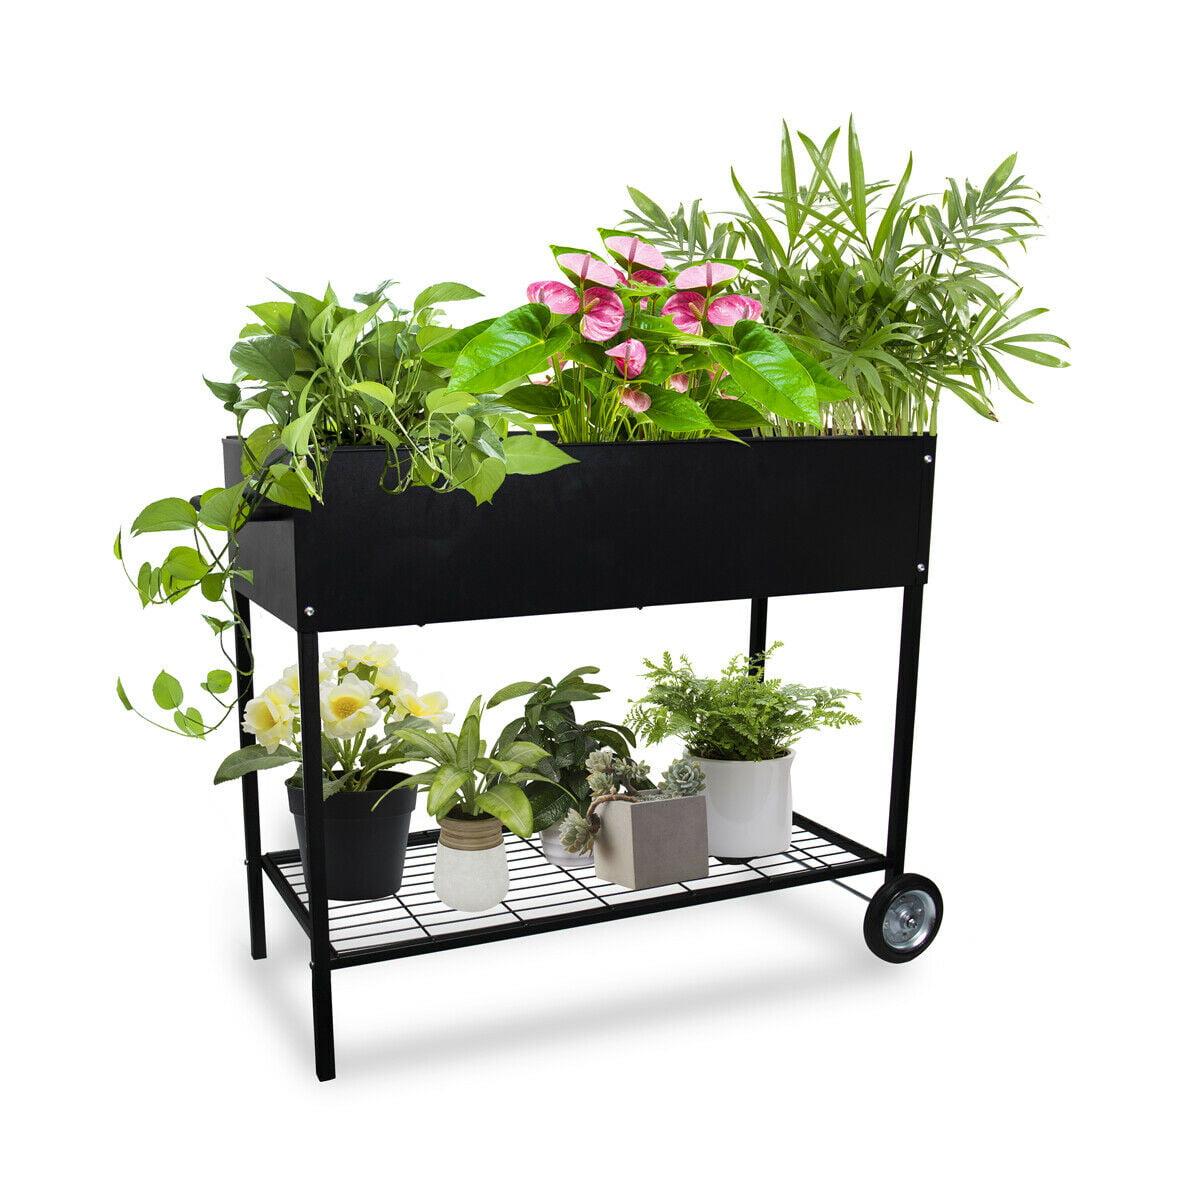 Raised Garden Bed With Legs Outdoor Raised Planter Box On Wheels Elevated Garden Bed For Vegetable Flower Herb Patio Walmart Com Walmart Com